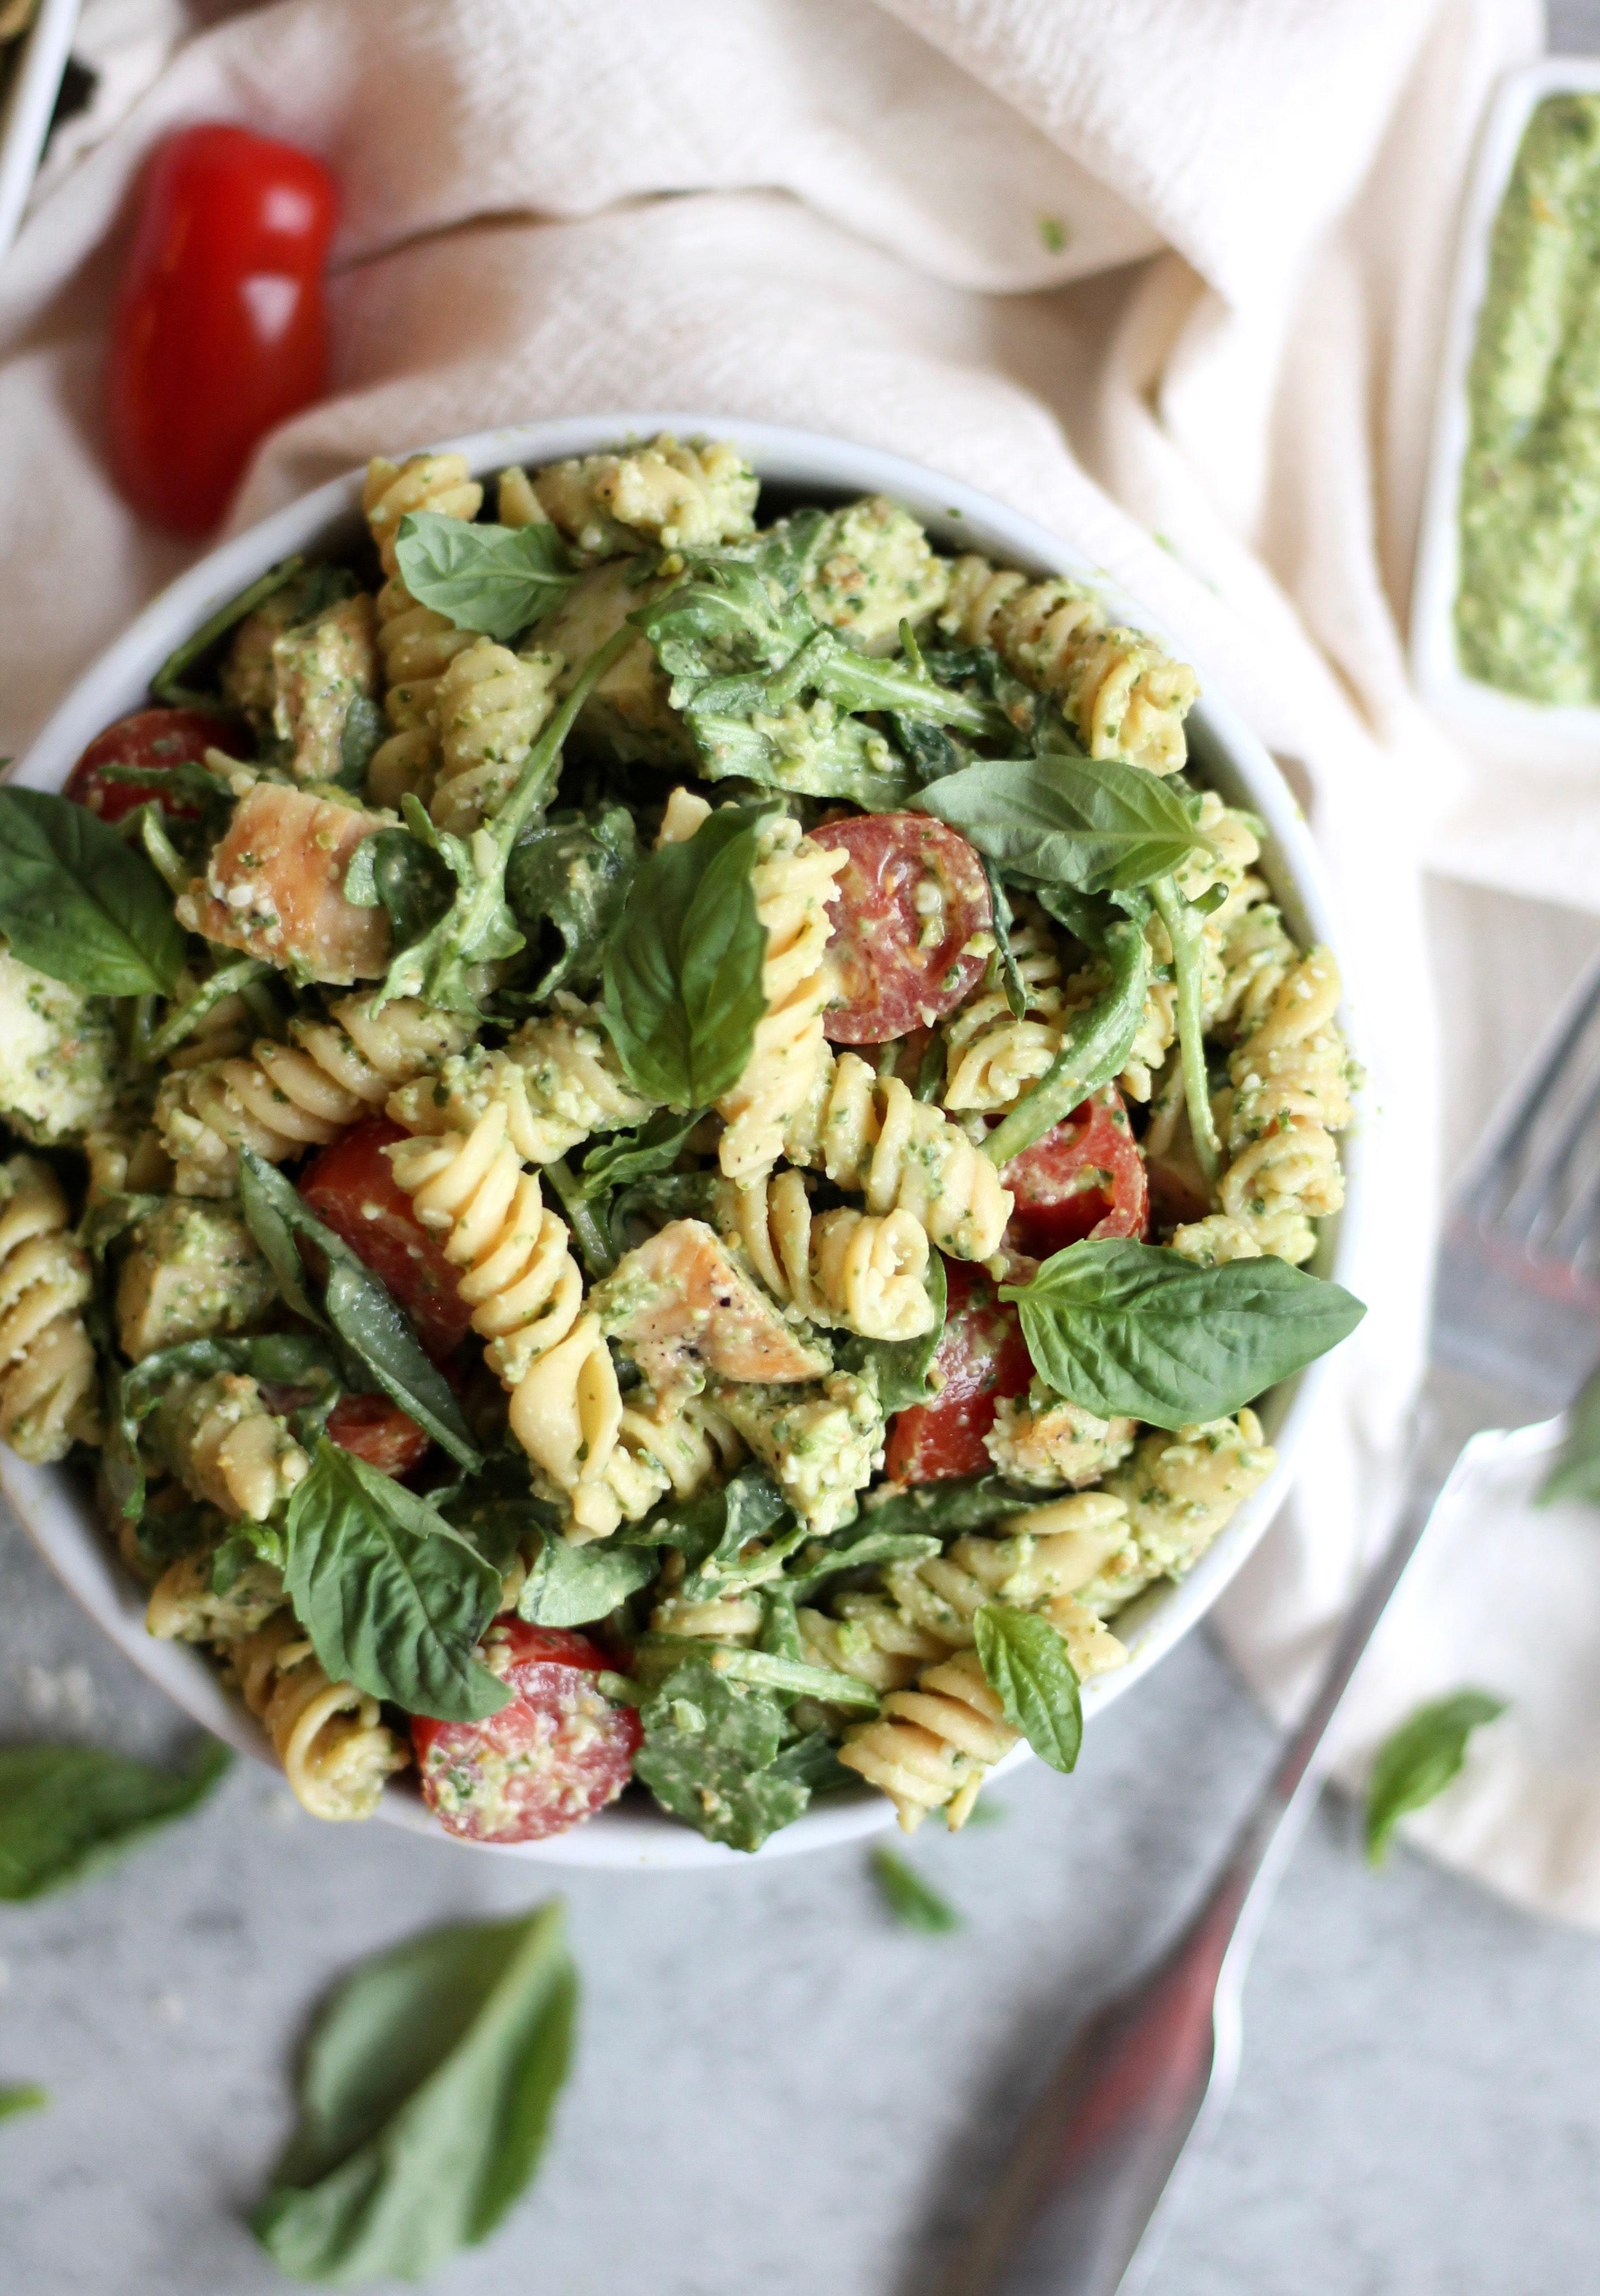 Greek Yogurt Caesar Pesto Pasta Salad with Grilled Chicken and Arugula